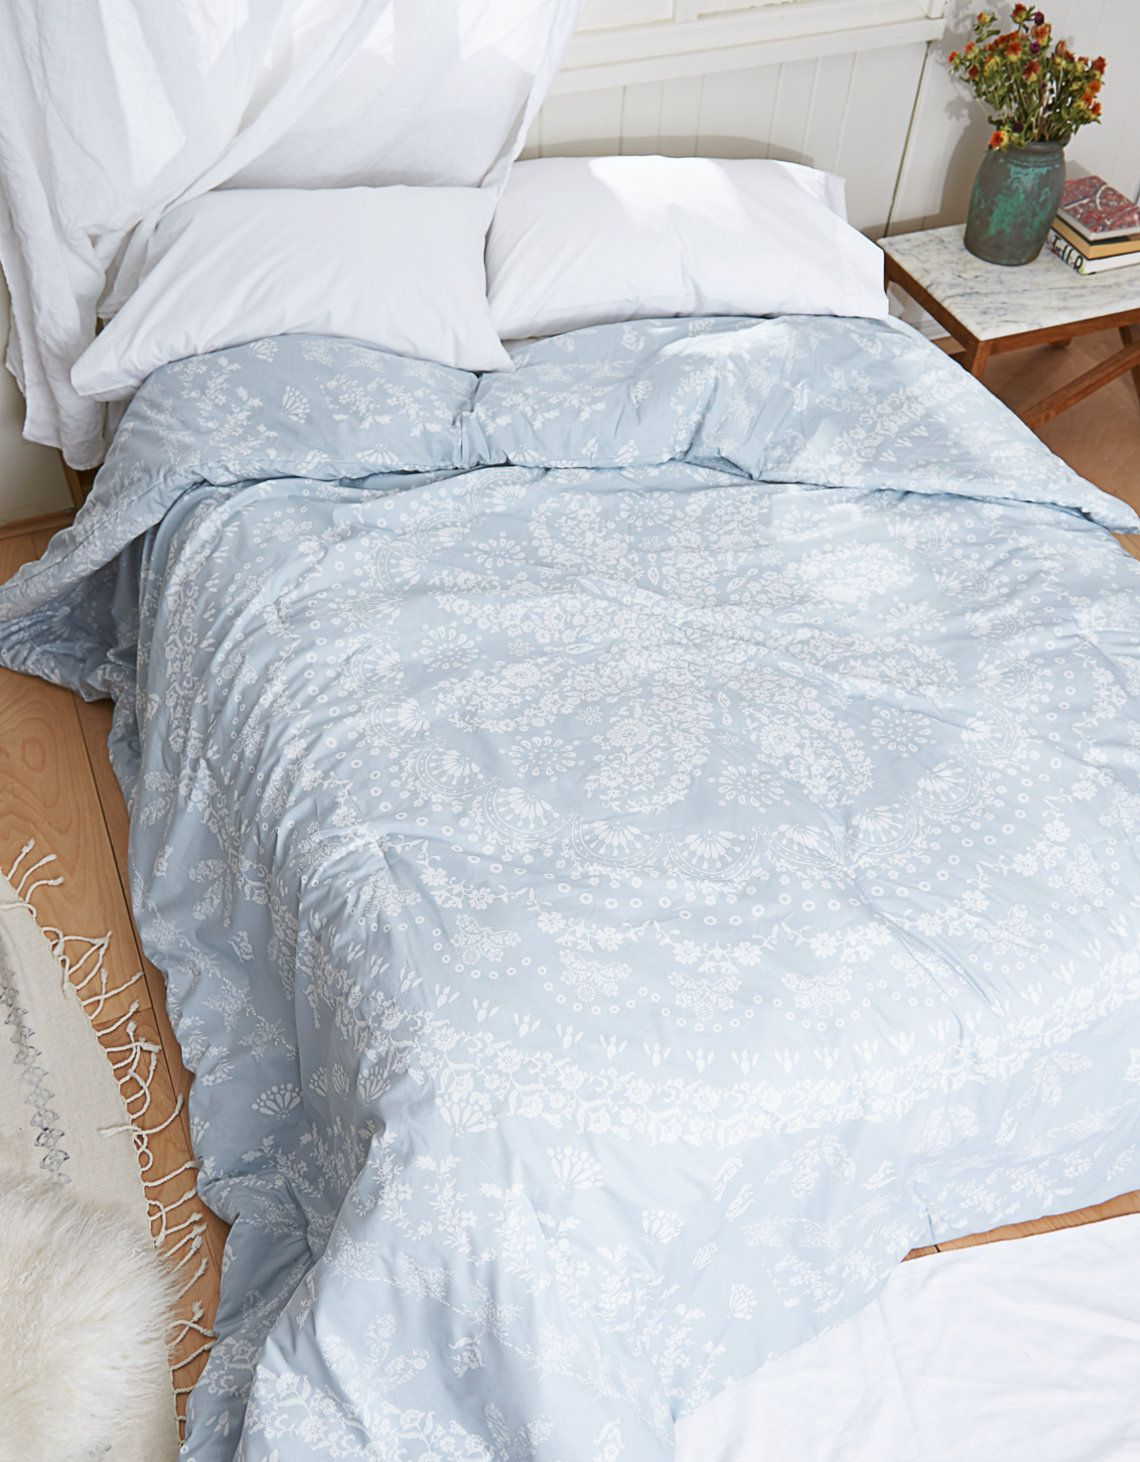 Aeo Apt Lina Tapestry Full Queen Comforter Set Queen Comforter Sets Comforter Sets Queen Comforter